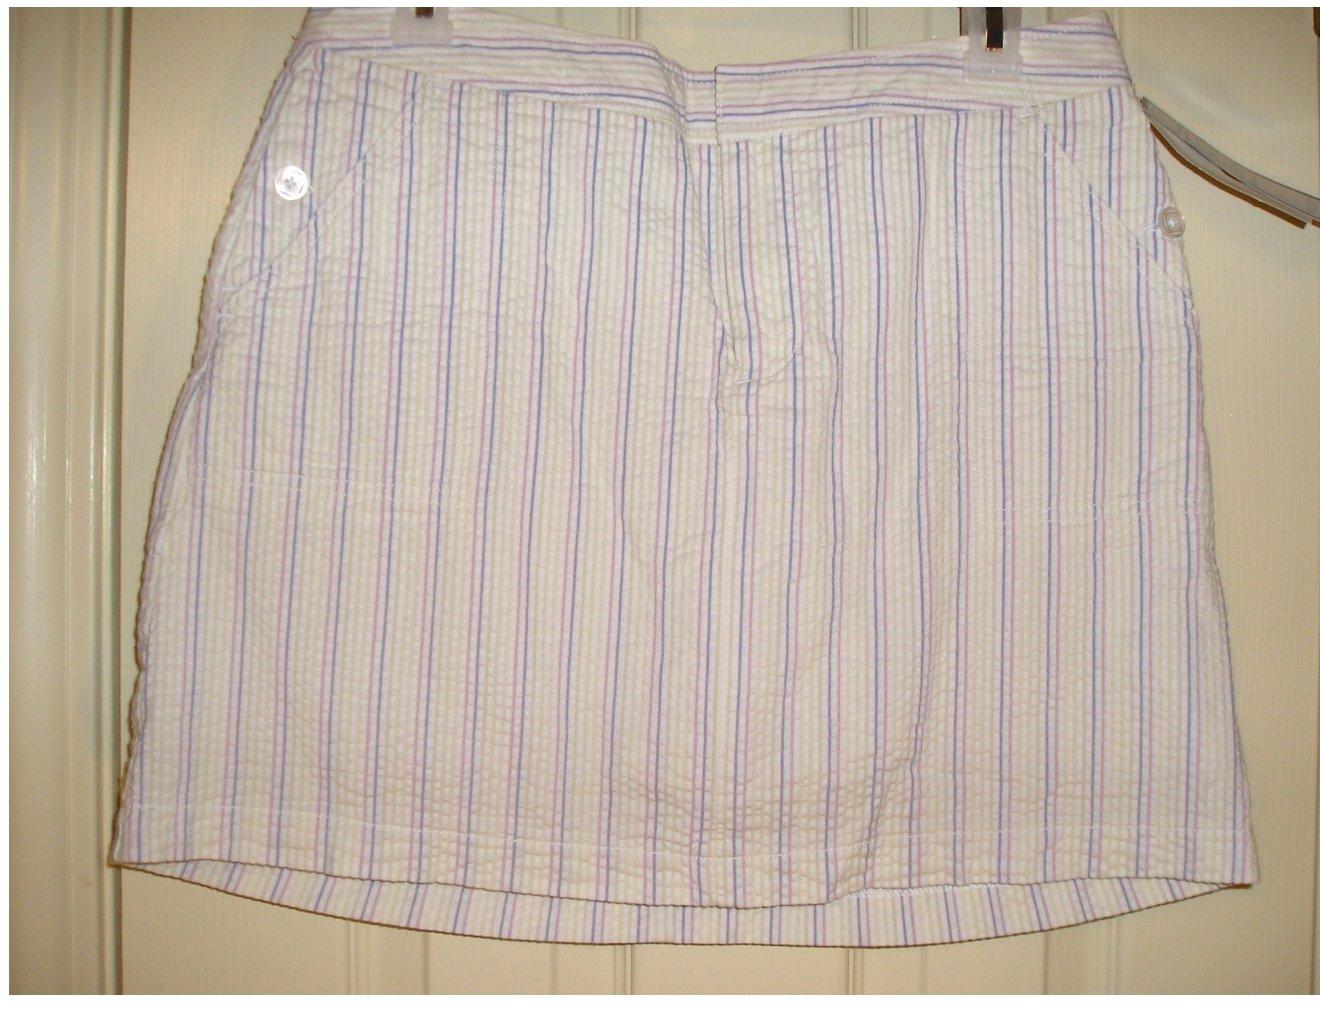 Dockers Brand Skorts or Scooter Style Short Skirt 6P NEW Seersucker